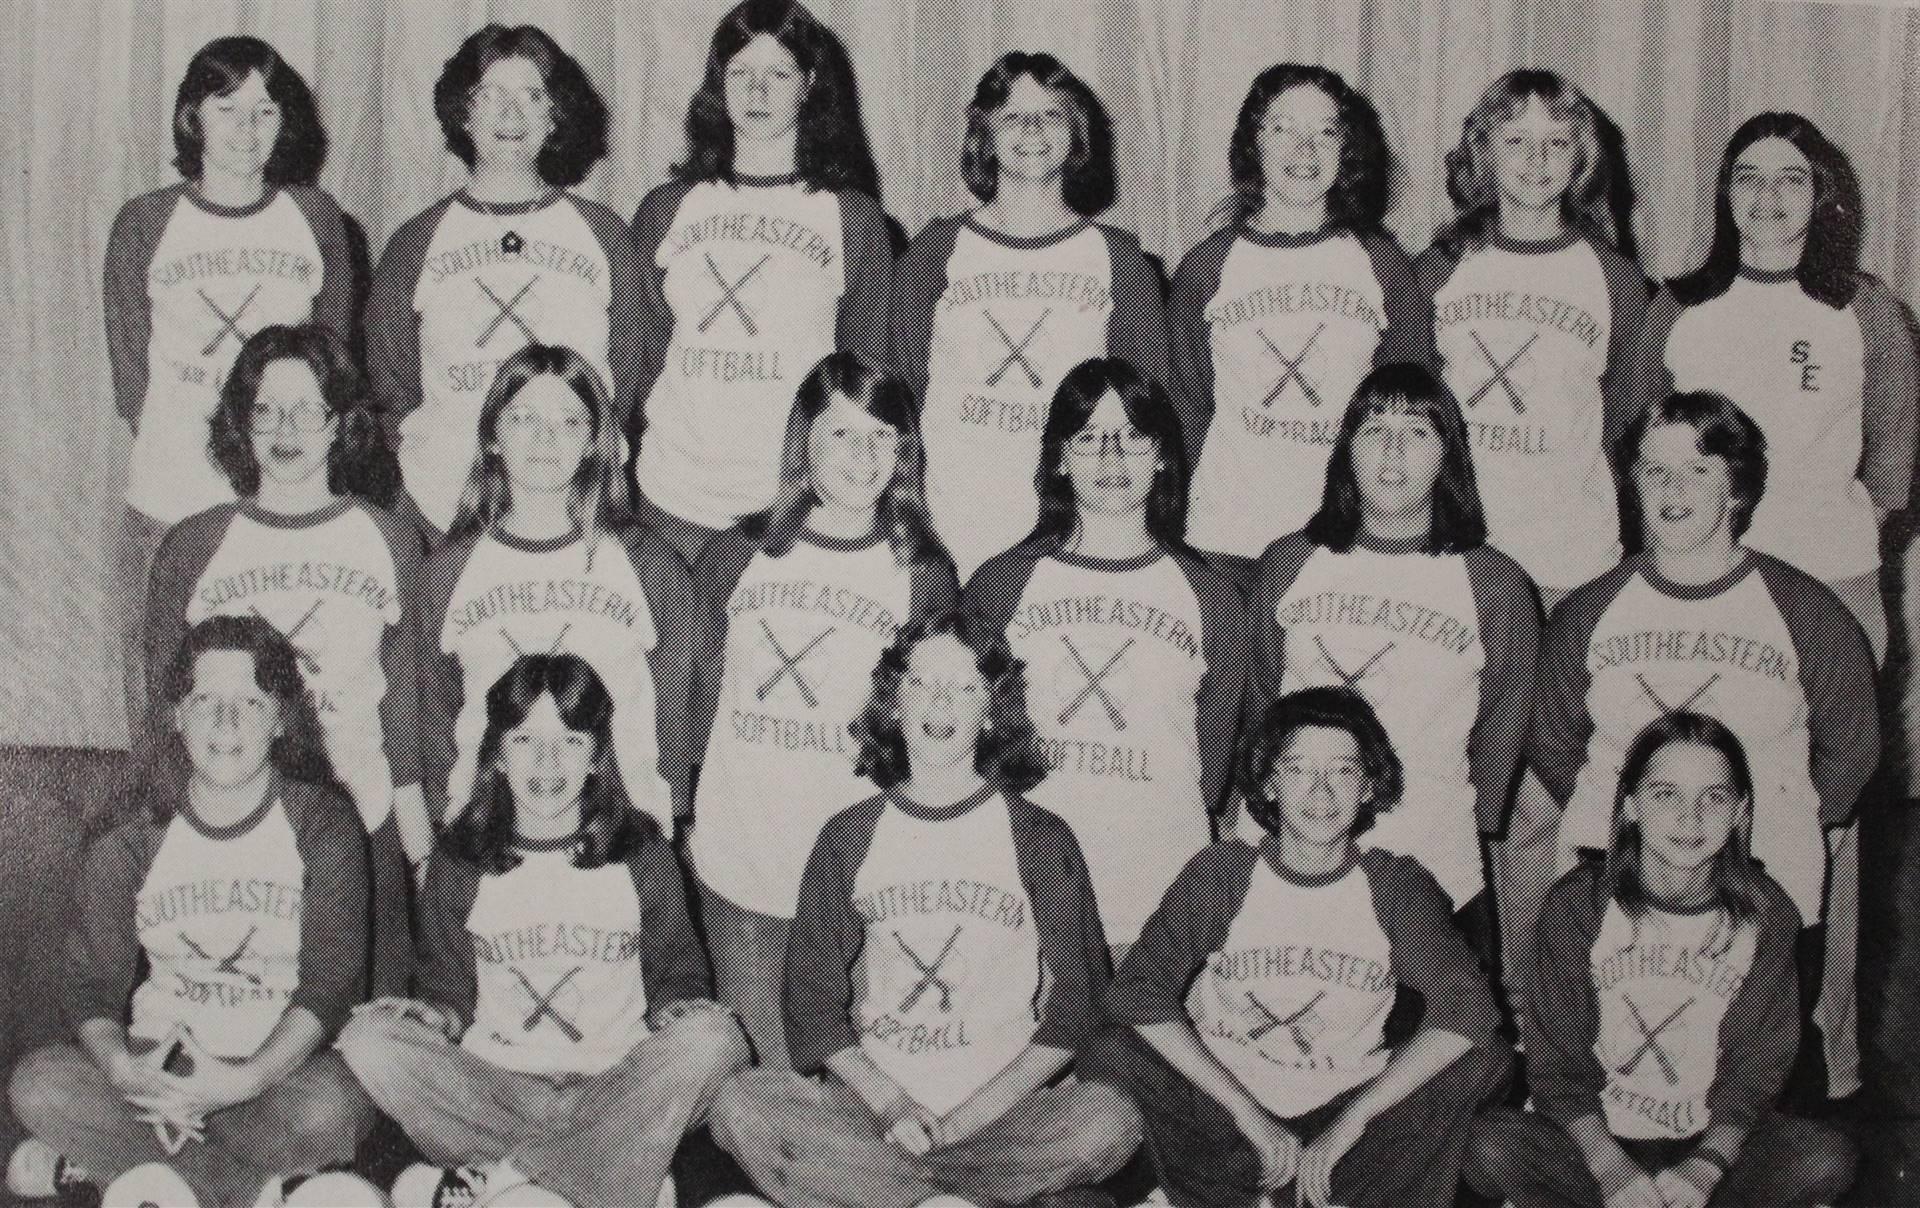 1977 Softball